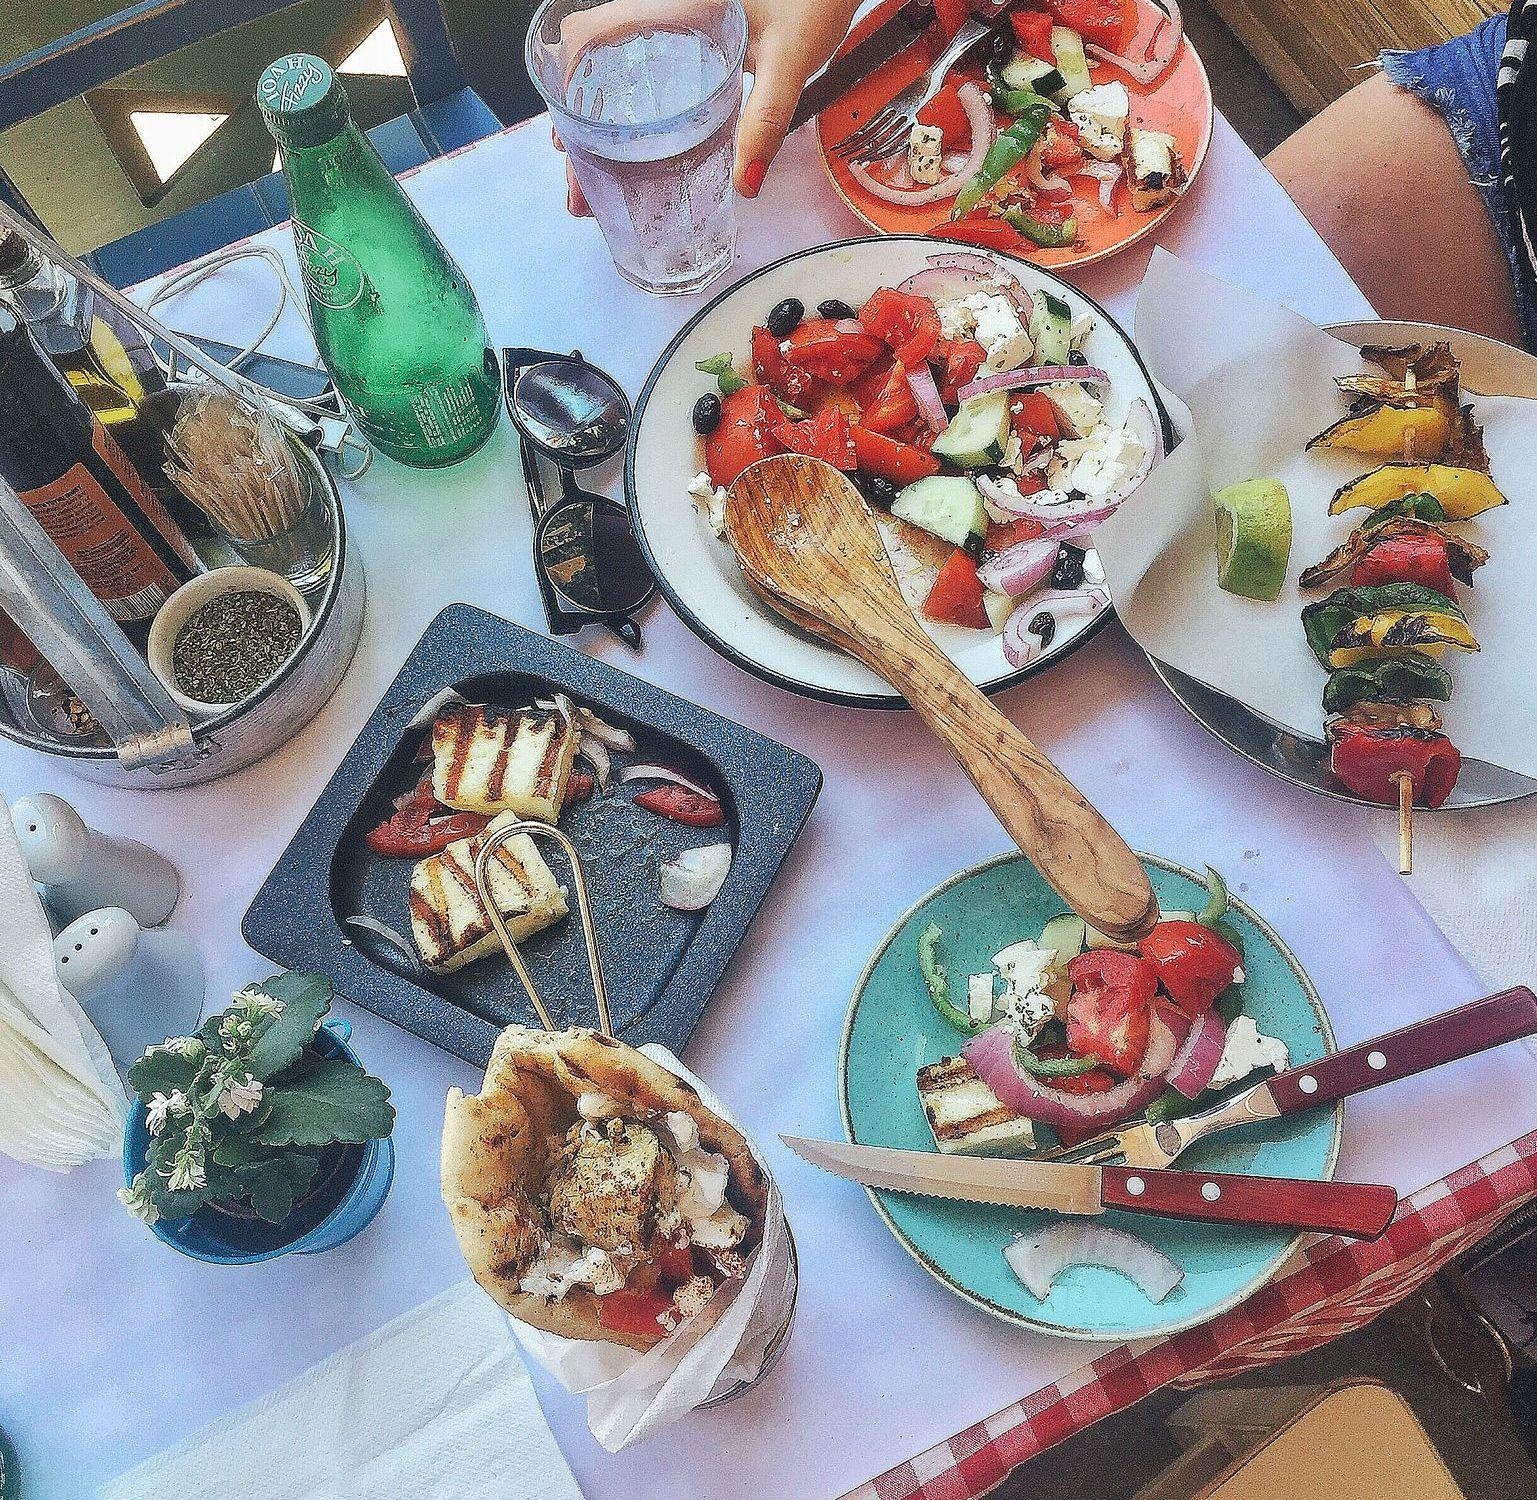 Crete Food (Road) Trip – The Food Life